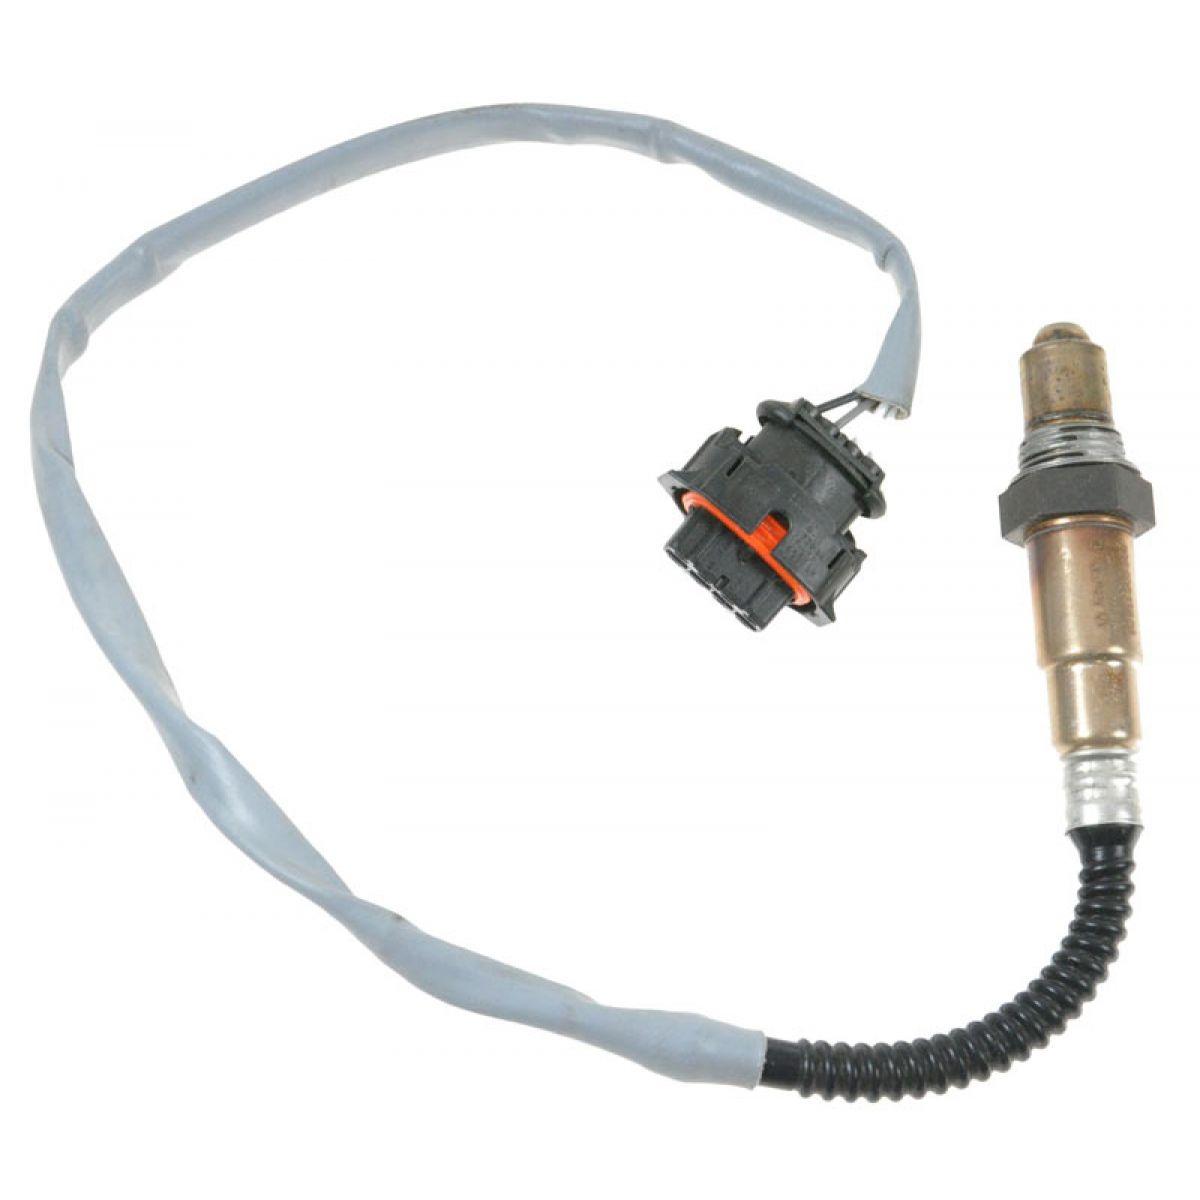 Oxygen Sensor O2 02 For Rendezvous CTS G8 911 9-3 Vue